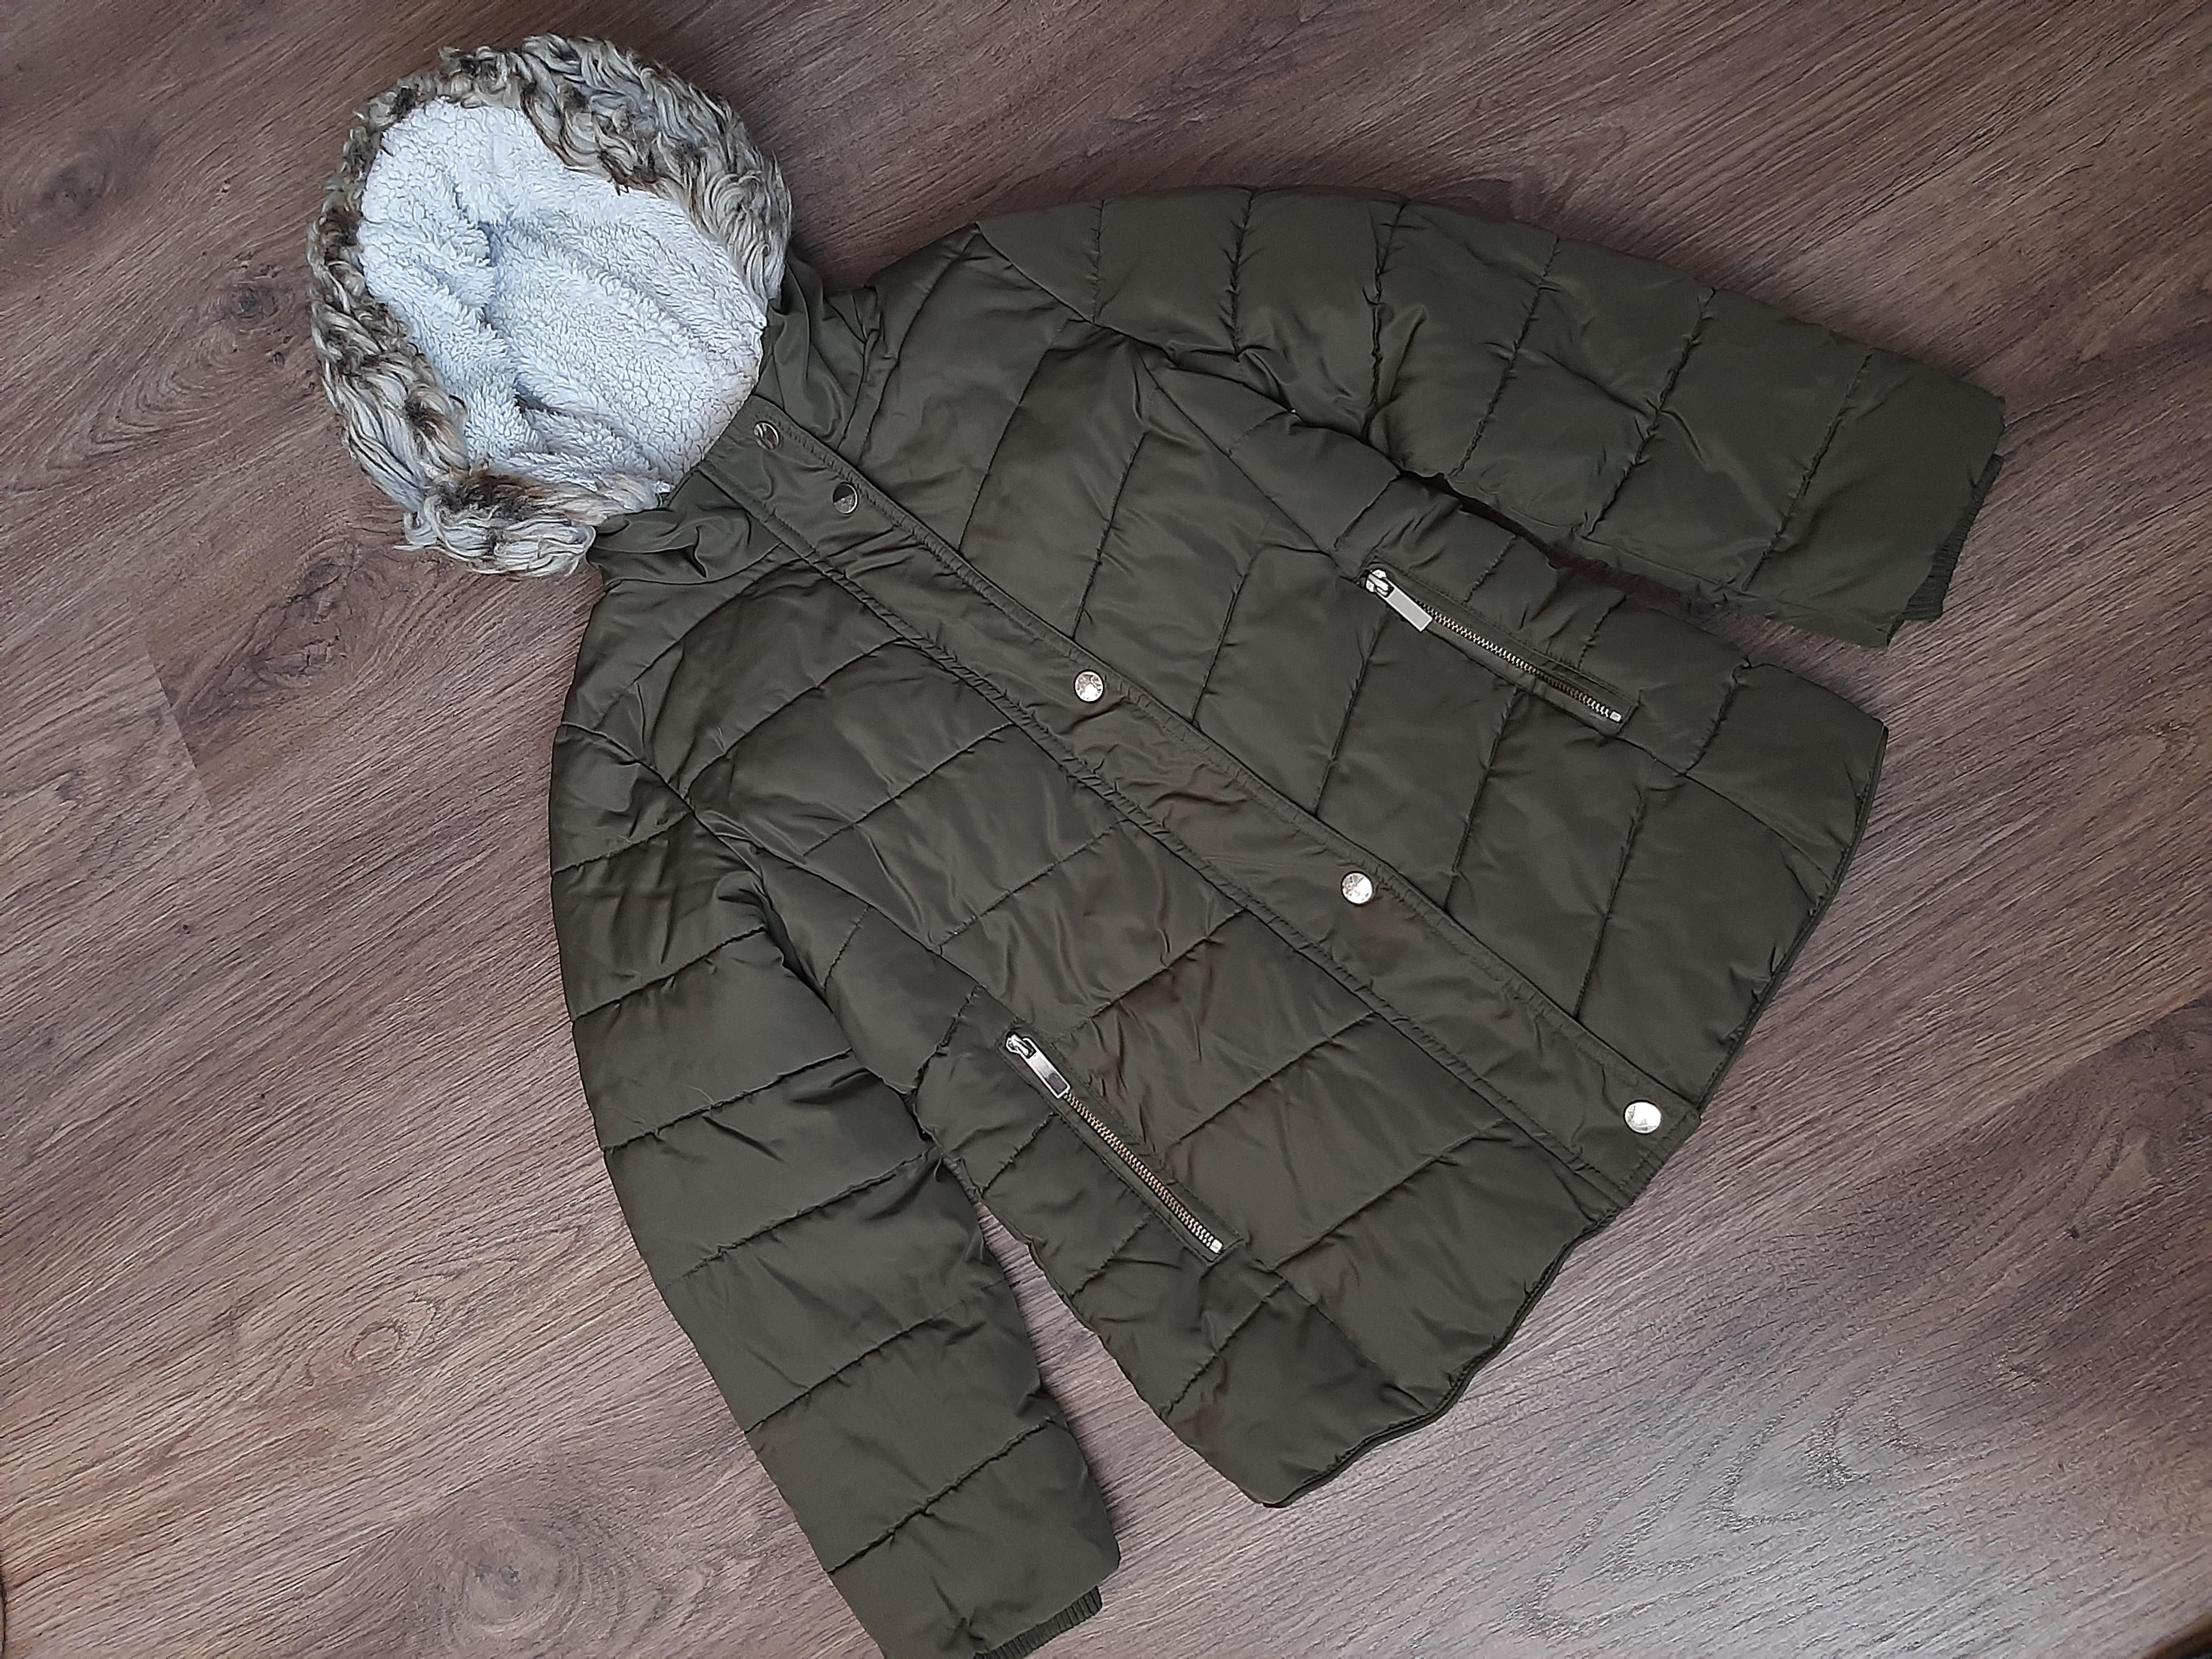 Теплая. фирменная,качественная, зимняя куртка на ребенка 10-11 лет!!!